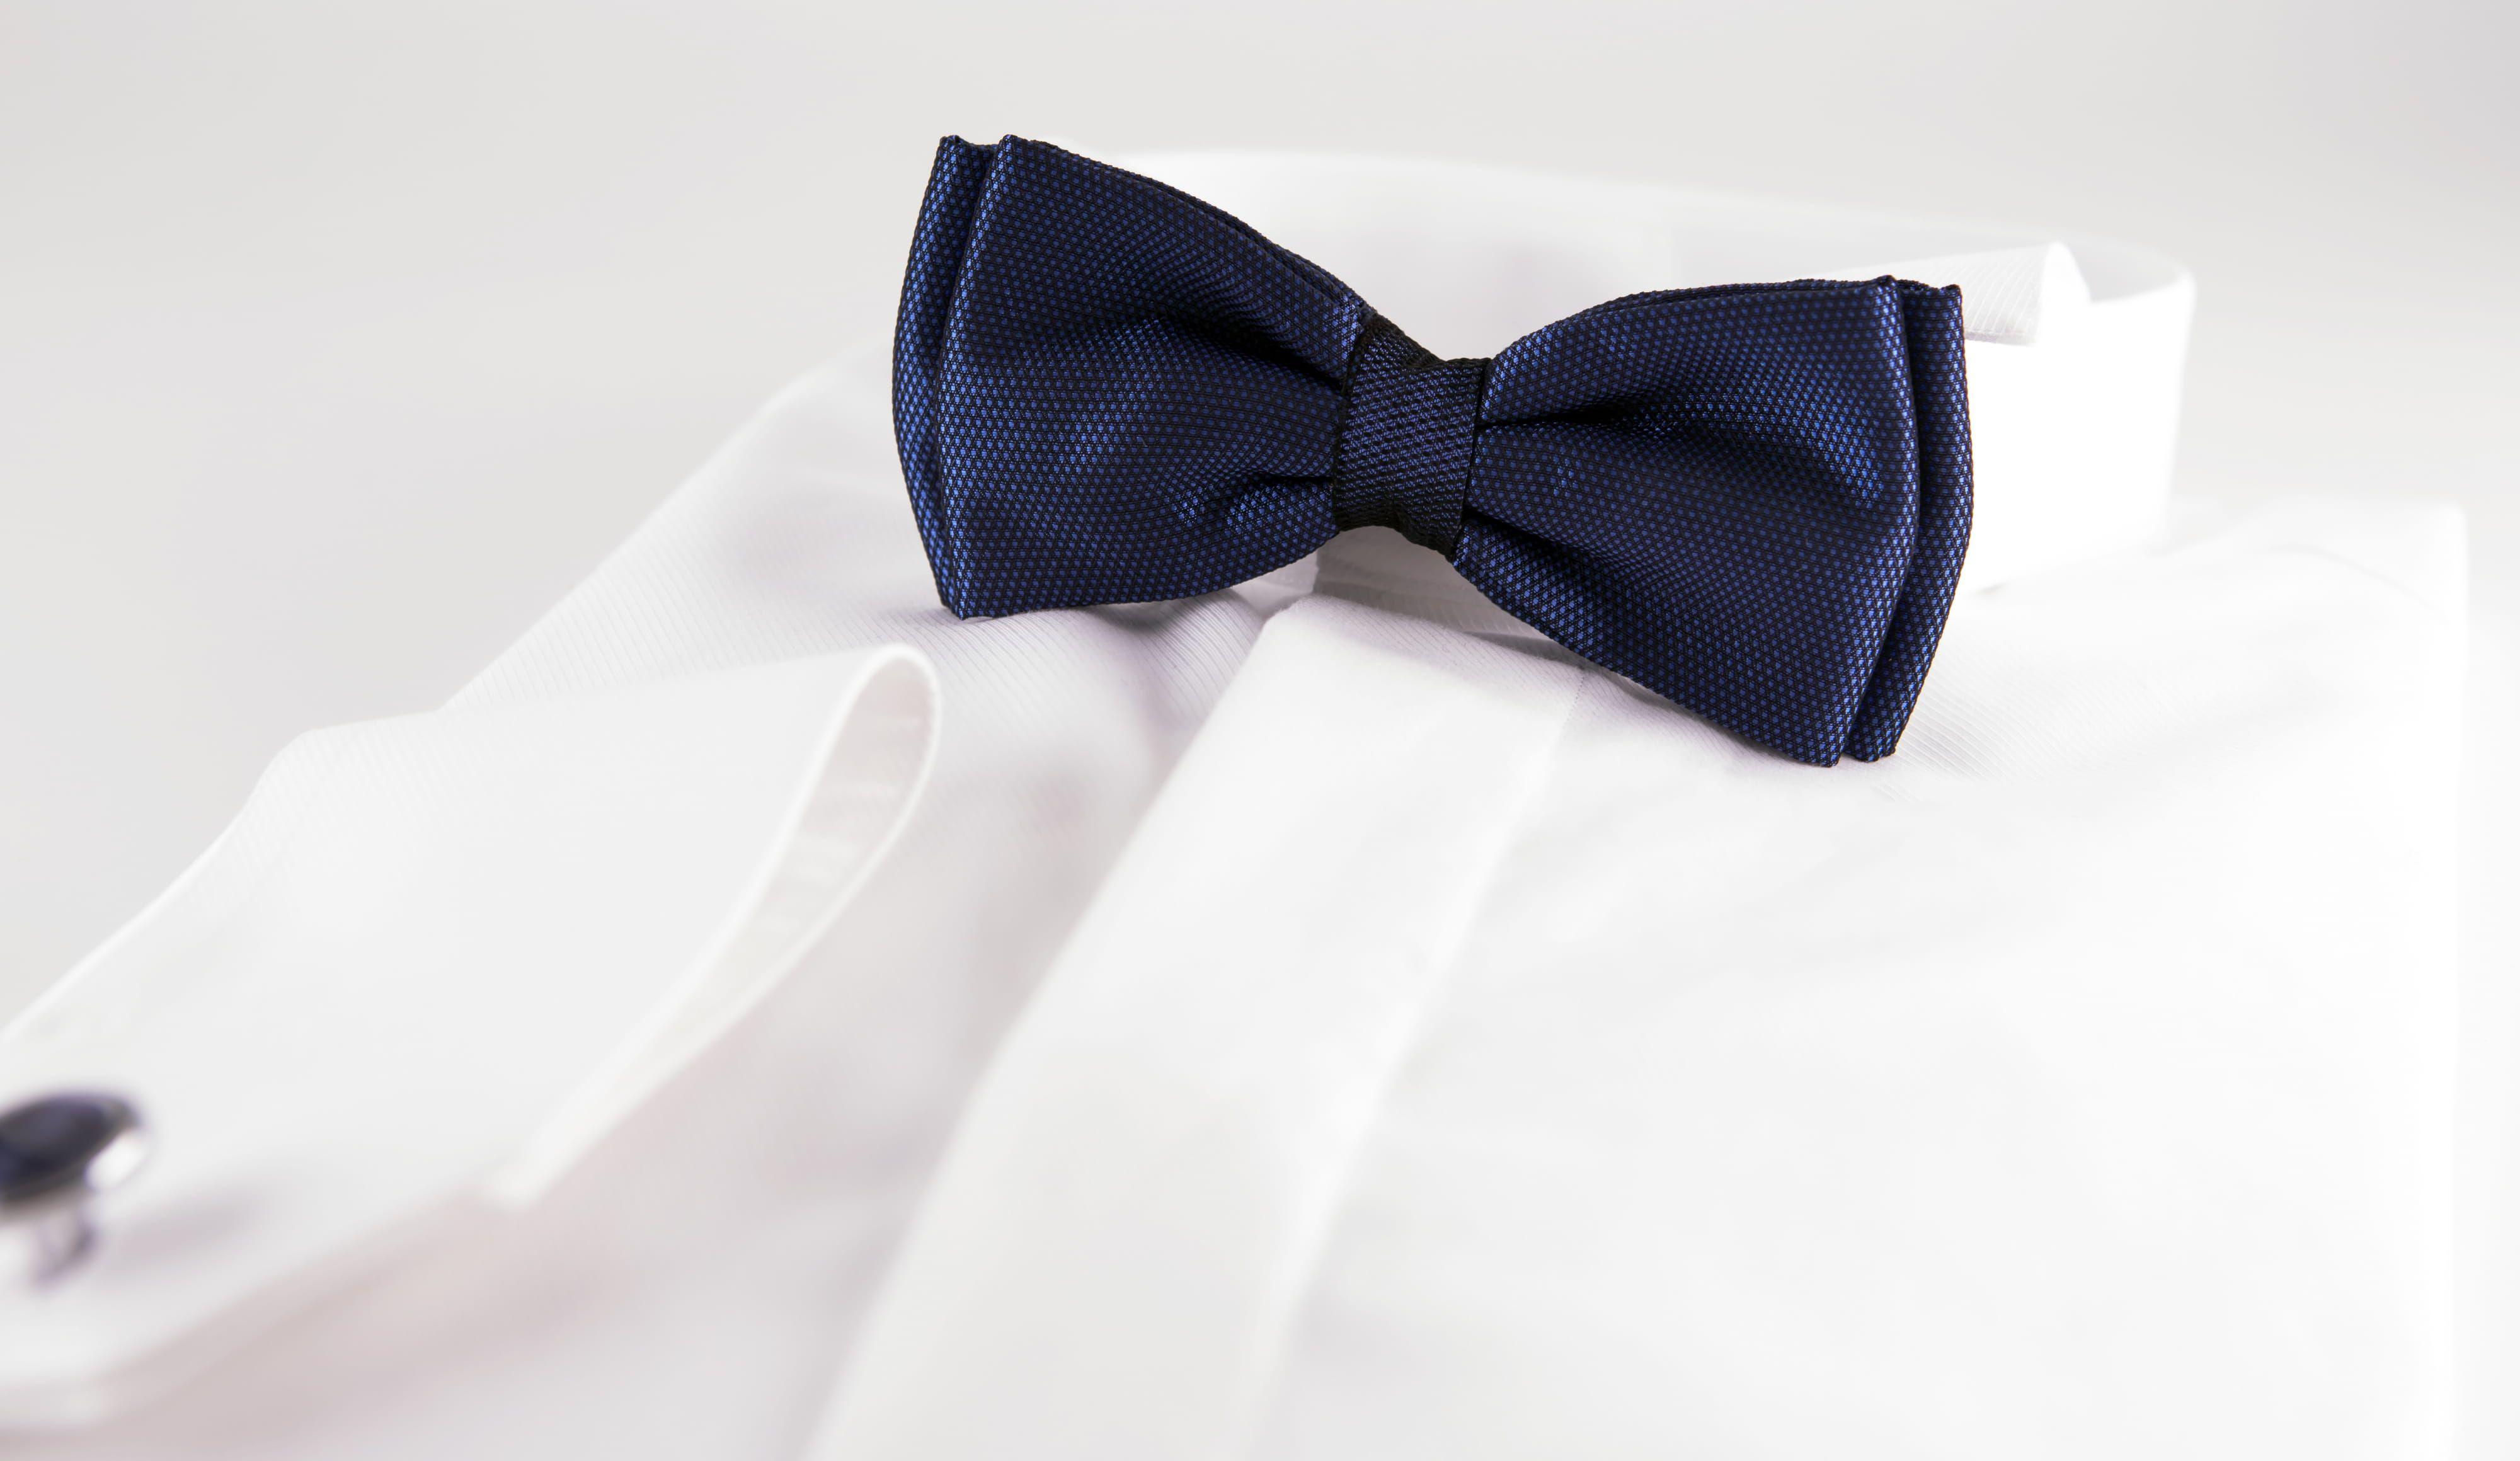 Cuscino Portafedi Bianco E Blu.Offerta Attuale Sposa Perfetta